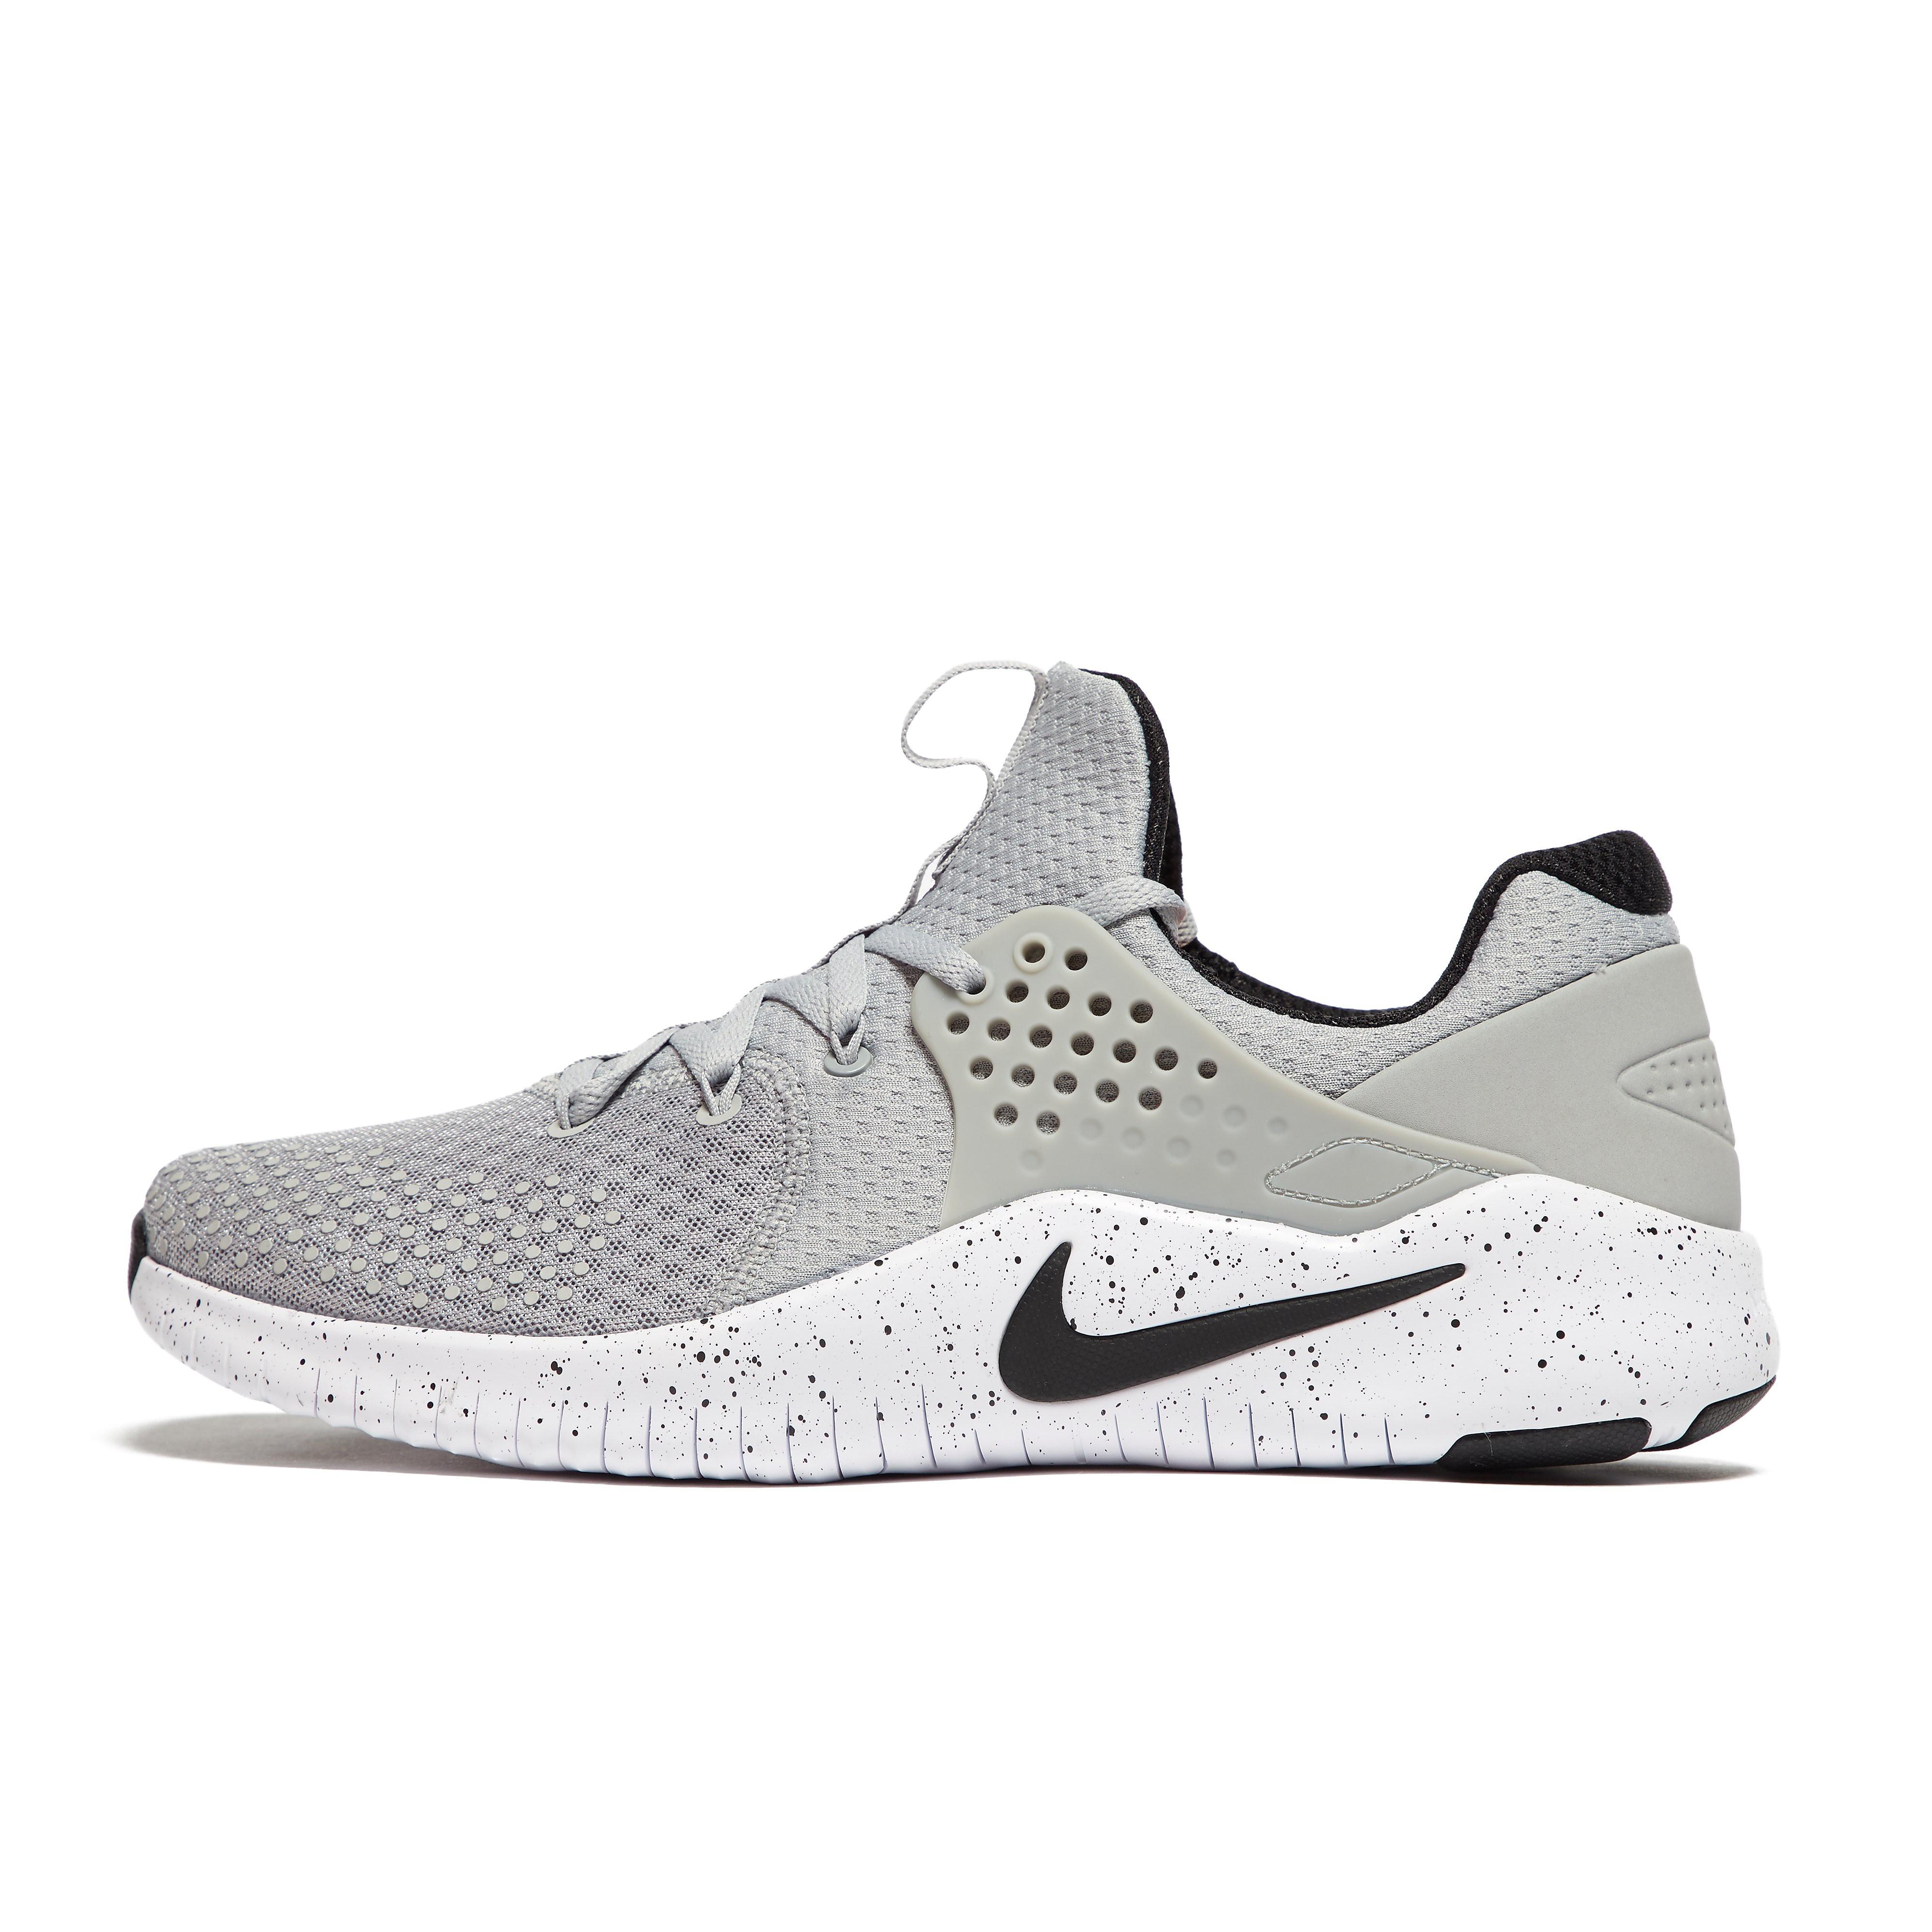 Nike Free TR V8 Men's Training Shoes